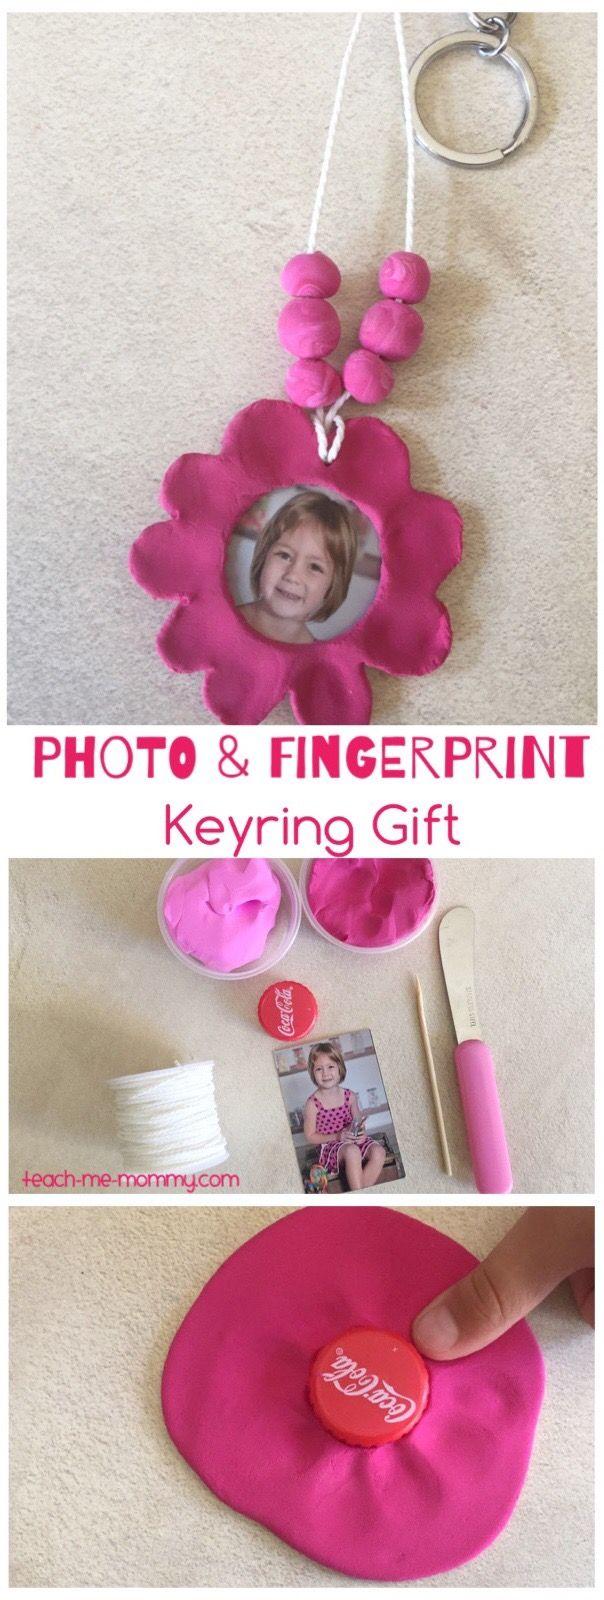 Photo & fingerprint keyring craft keepsake- perfect for Mother's Day